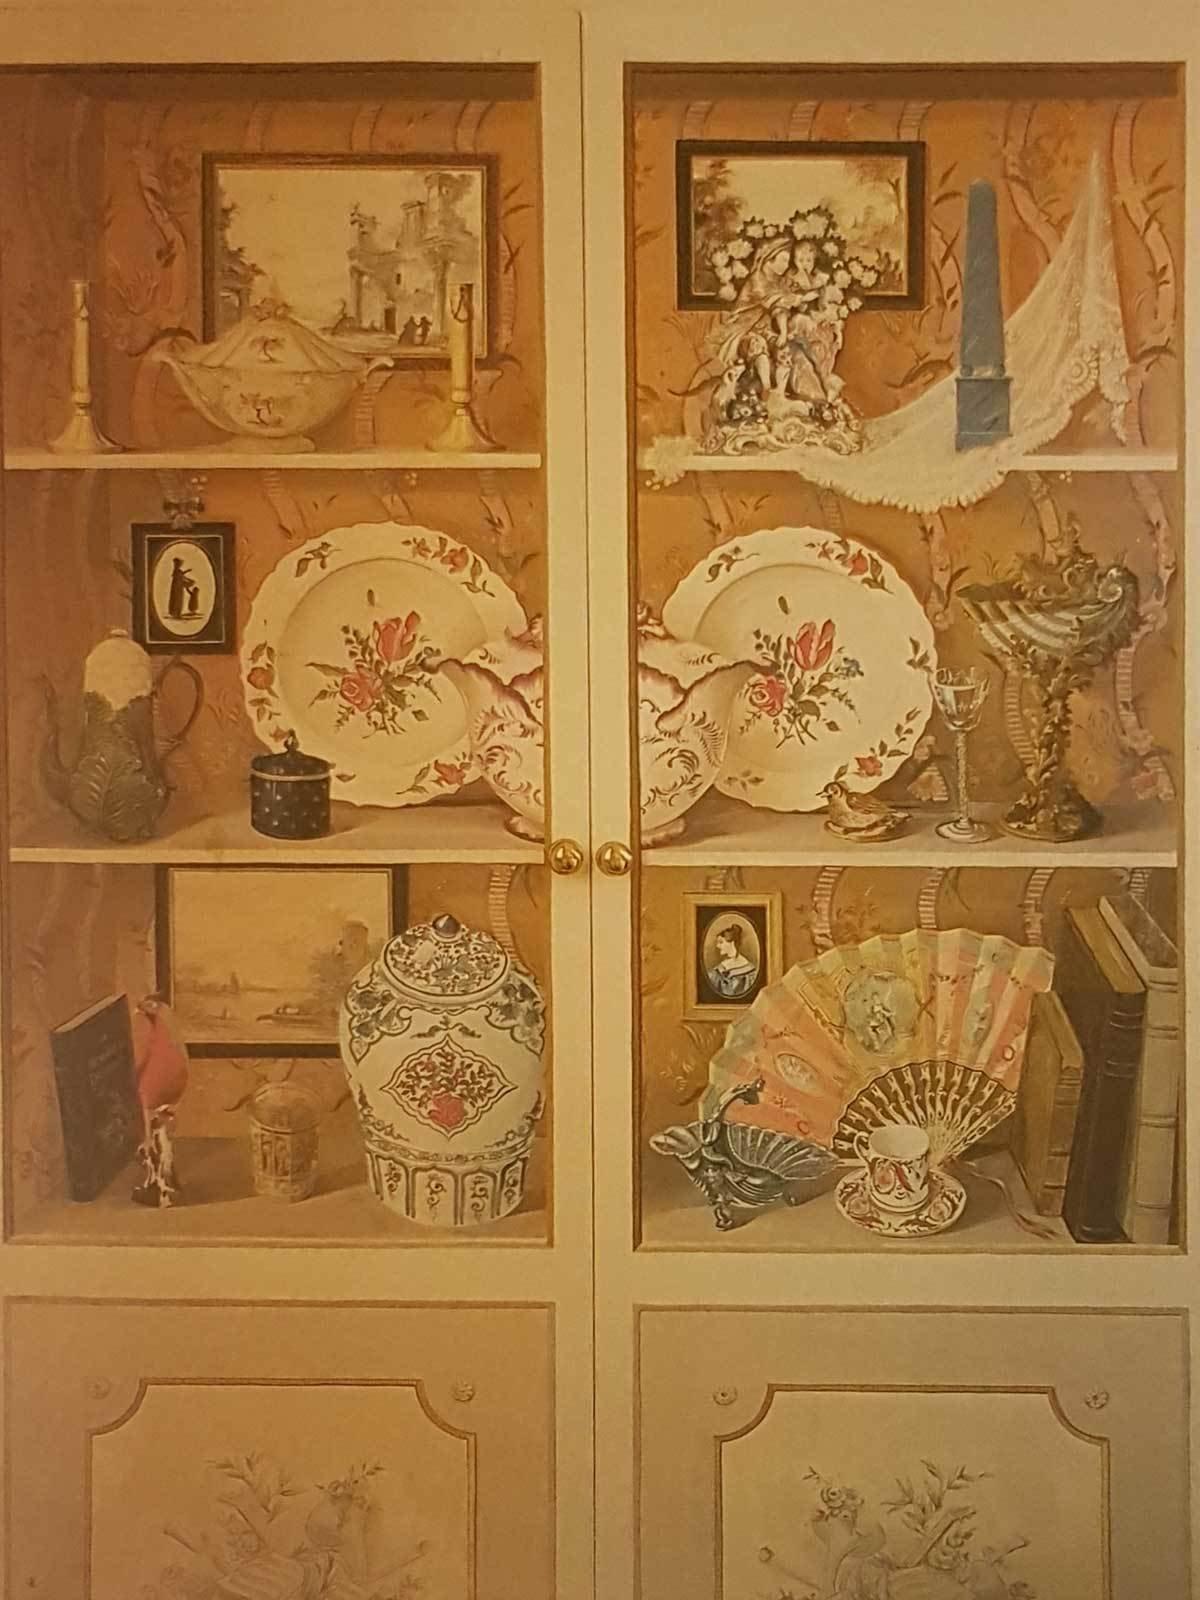 Tony Raymond Mural